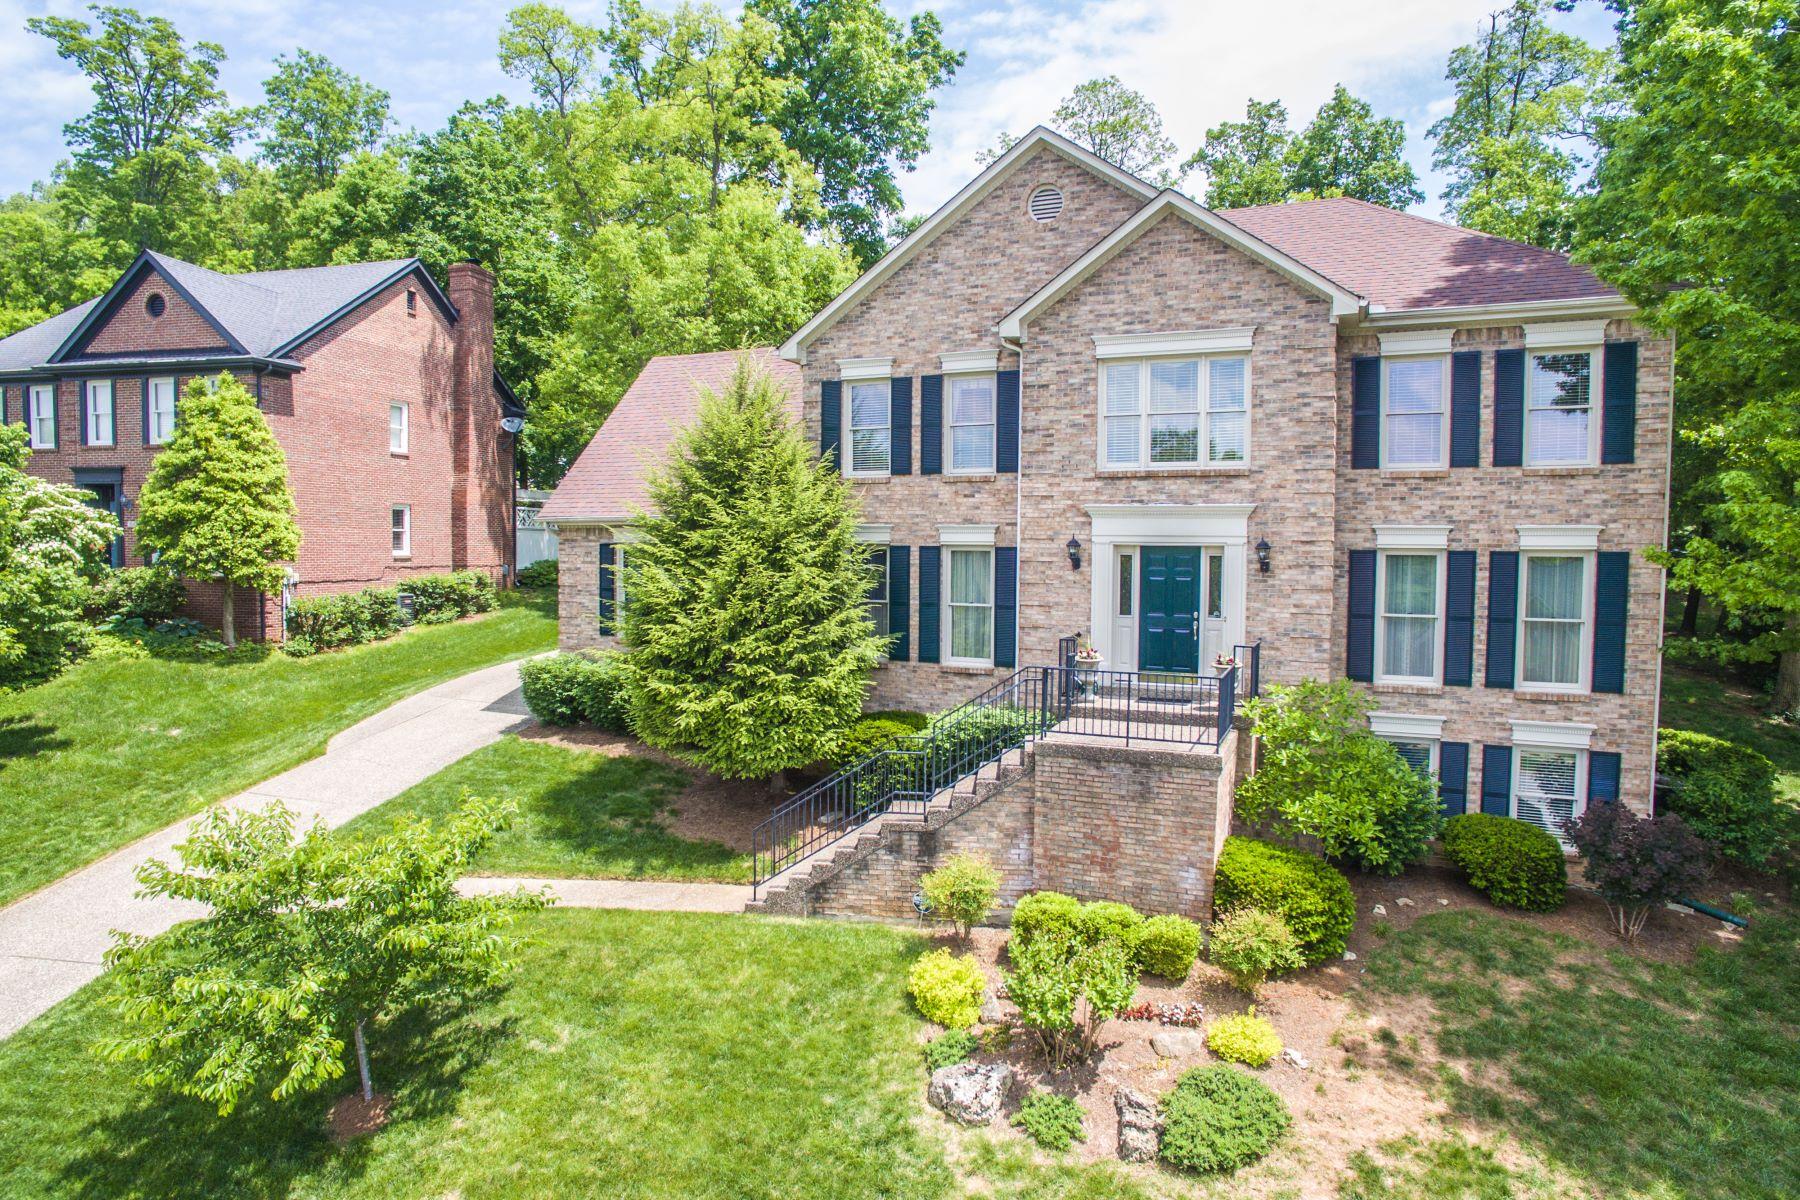 Vivienda unifamiliar por un Venta en 10420 Worthington Lane Prospect, Kentucky, 40059 Estados Unidos